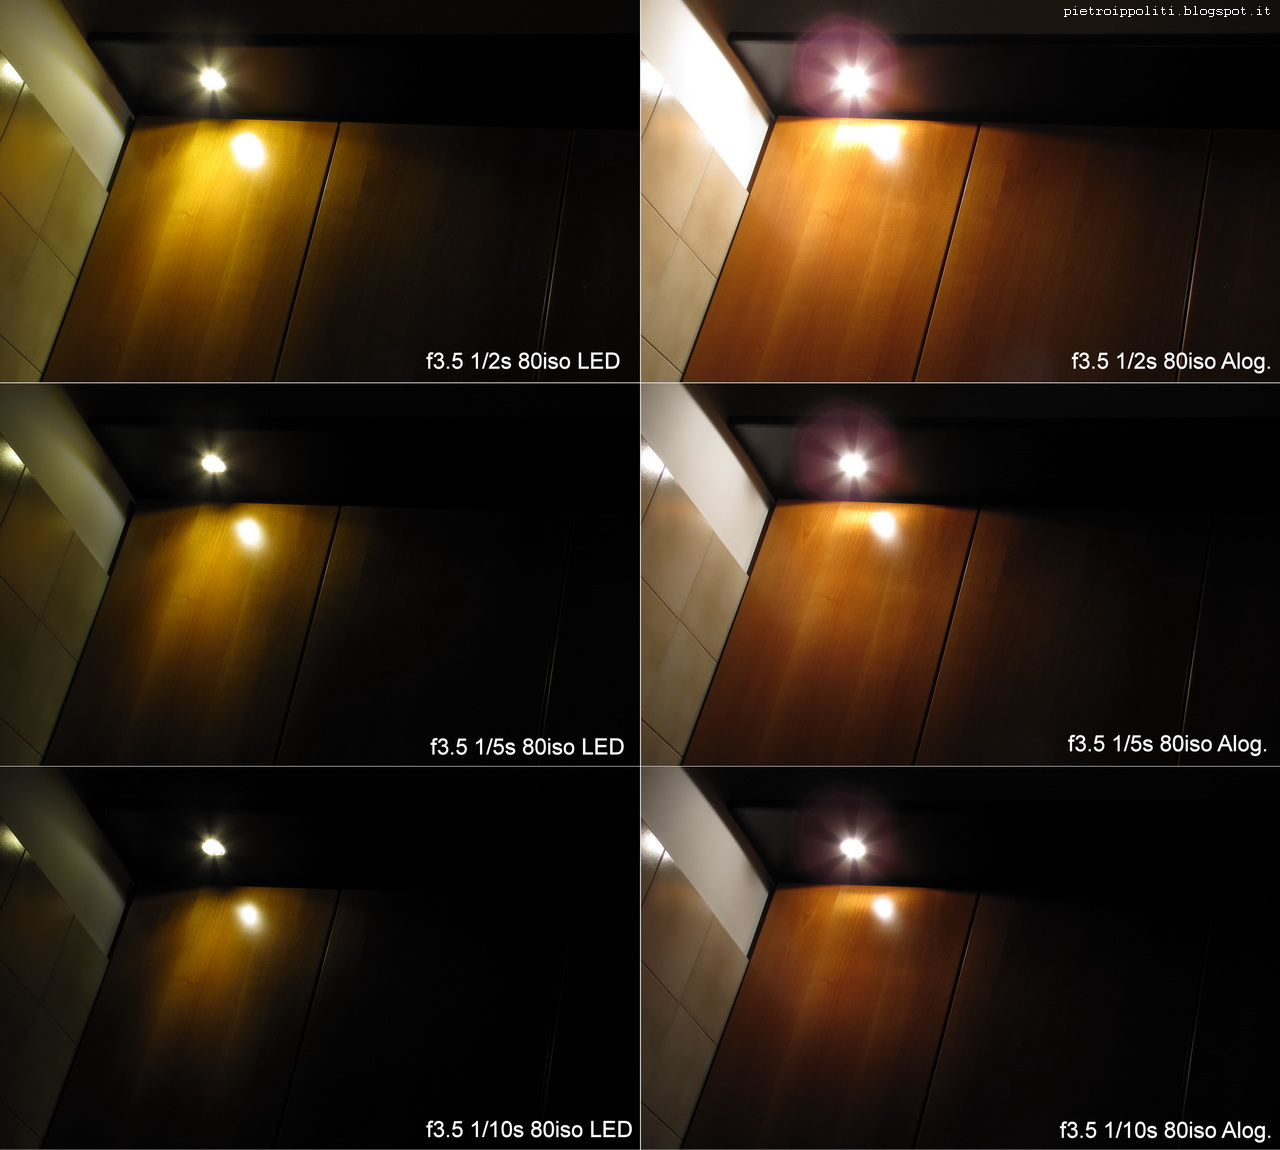 lampadina alogena led : Pietro Ippoliti Thorndyke : Test Lampadine G4 12v a LED COB